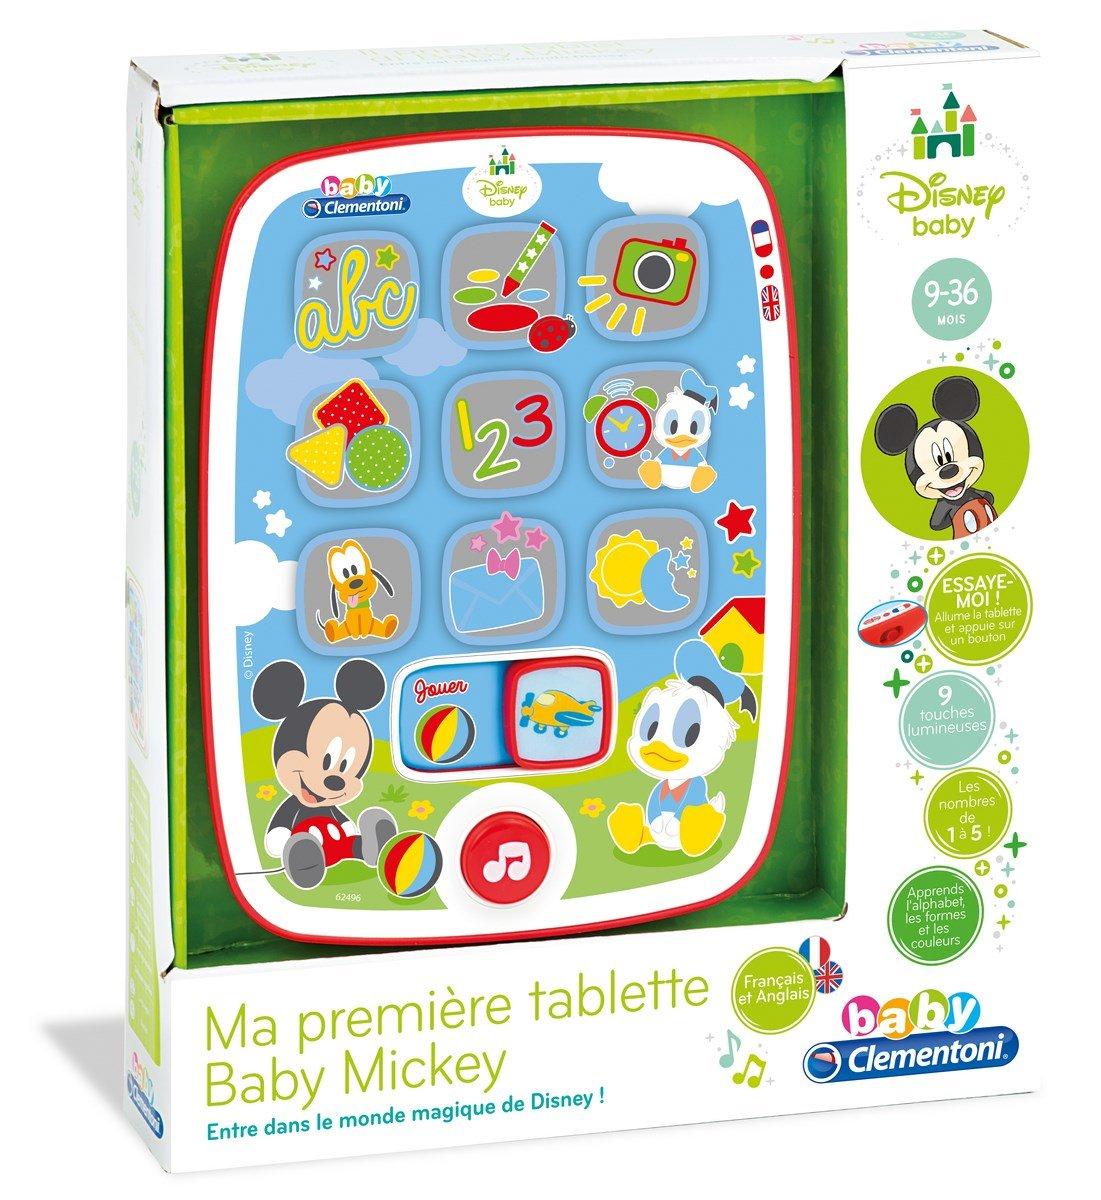 Clementoni - 62496 - Ma première Tablette Baby Mickey - Disney - Premier age 62496.6